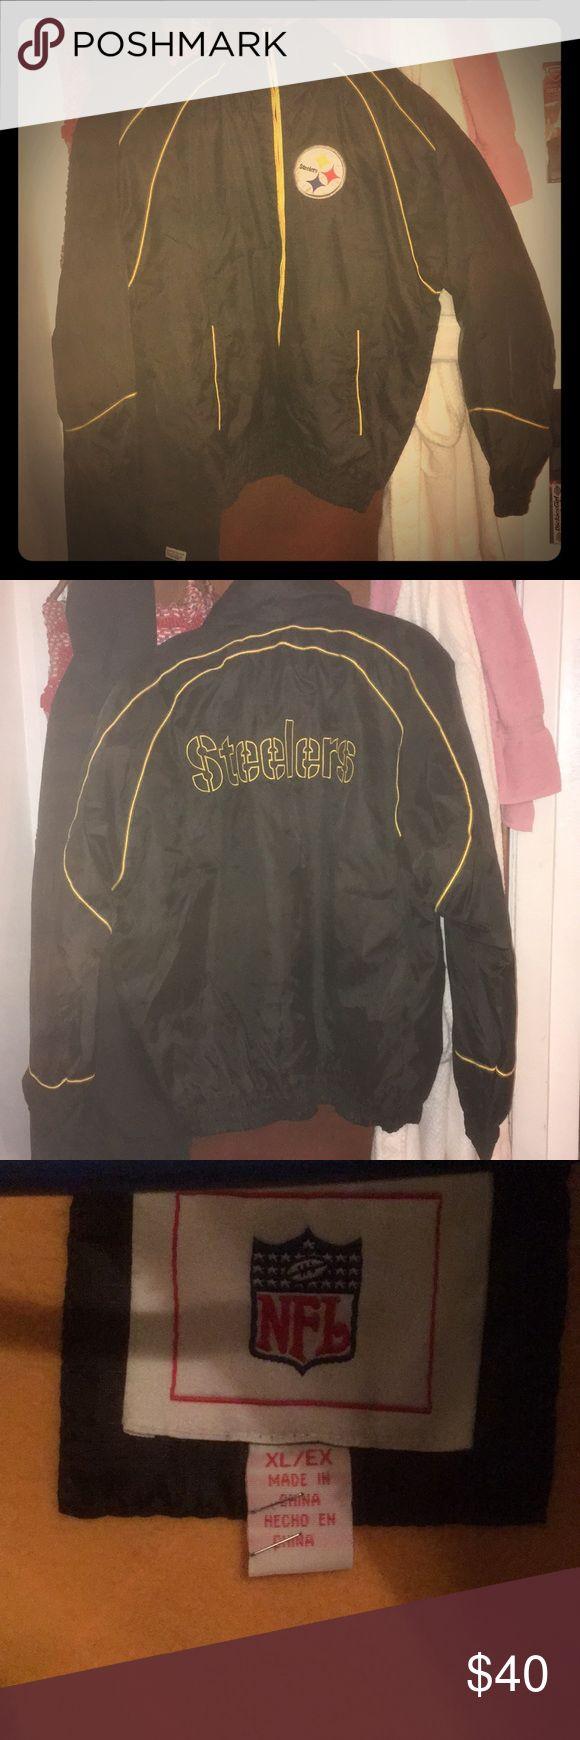 Pittsburgh Steelers Jacket Pittsburgh Steelers Jacket nfl Jackets & Coats Bomber & Varsity